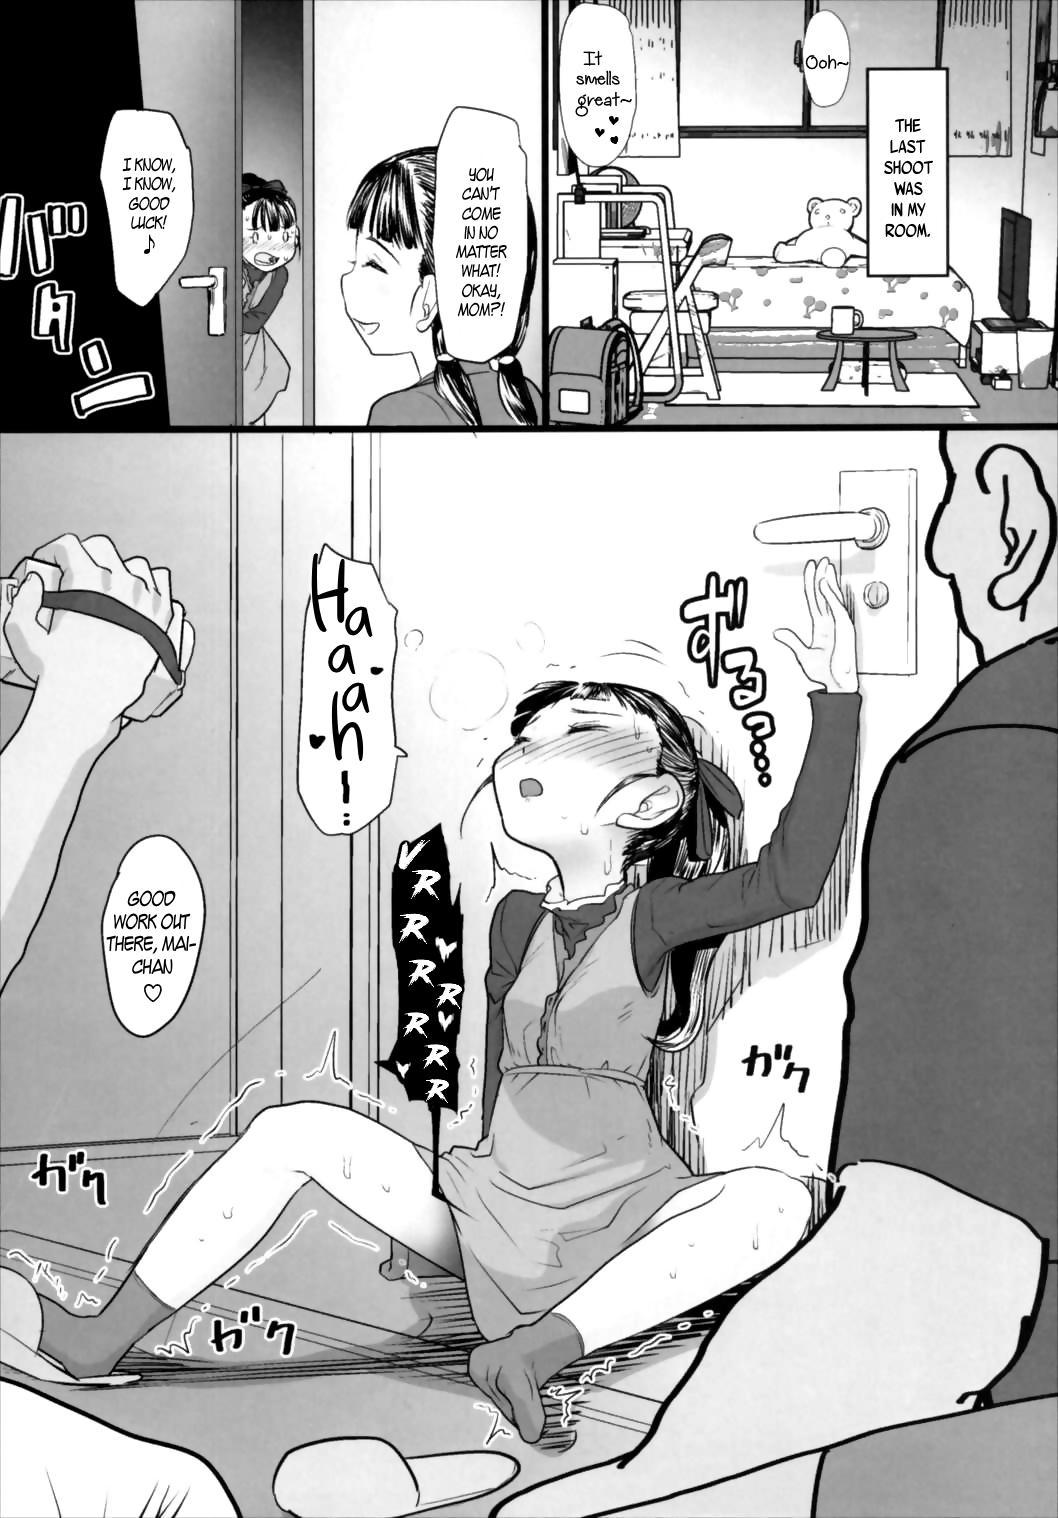 (C89) [Sugiura-ke (Sugiura Jirou)] Mai-chan no Otaku Houmon   Mai-chan's Home Visit (THE IDOLM@STER CINDERELLA GIRLS) [English] {AkazaChan & B.E.C. Scans} 6